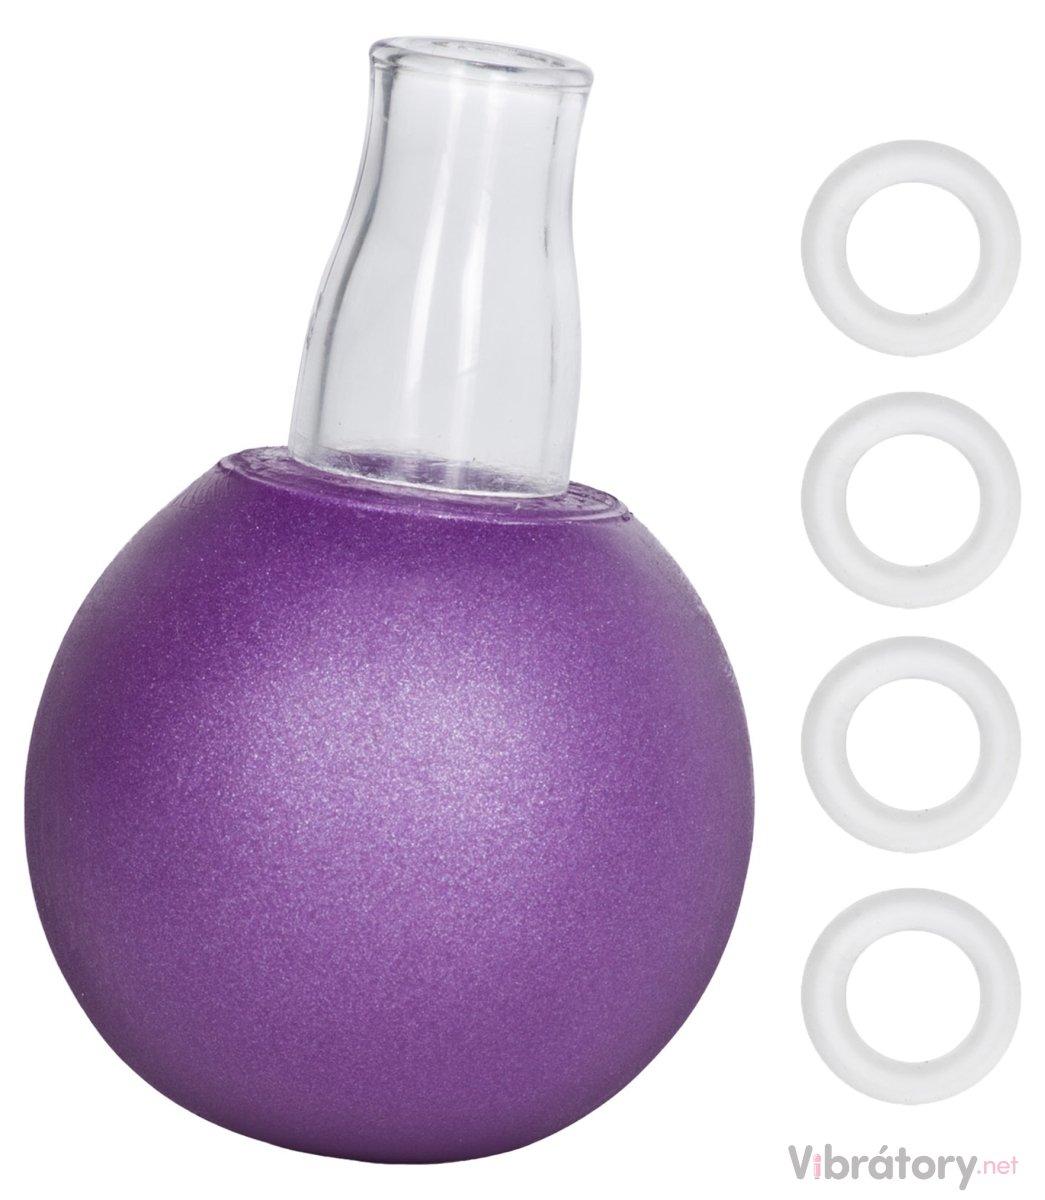 Přísavka na bradavky Nipple Play, fialová